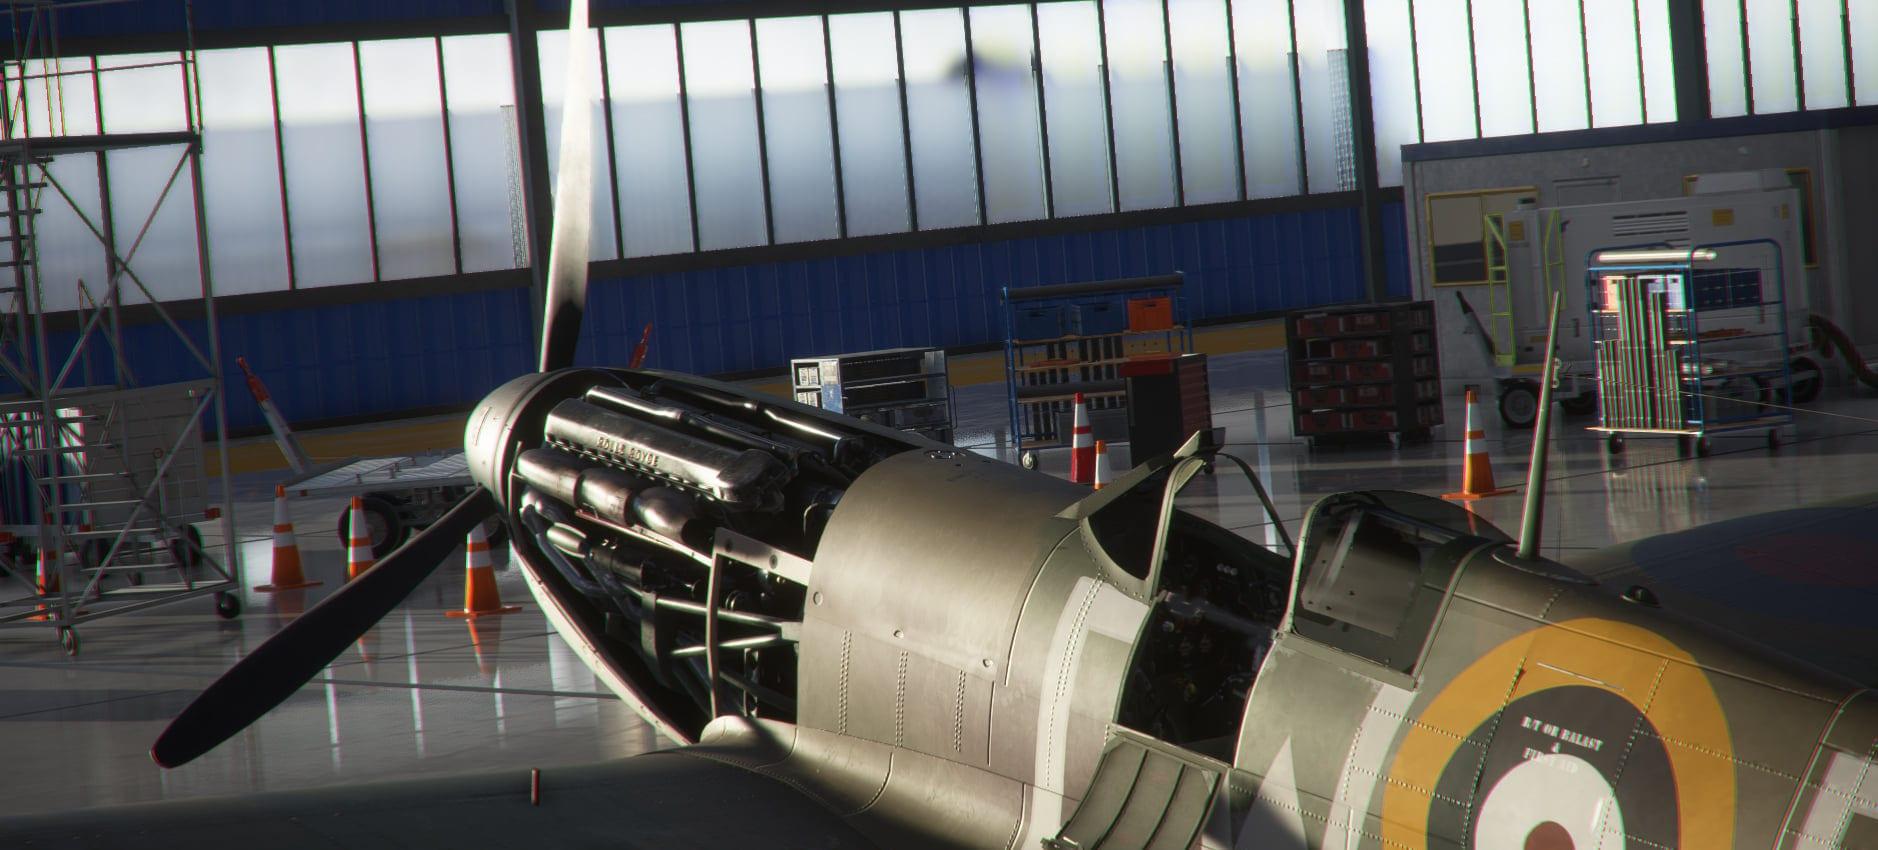 Microsoft Flight Simulator Spitfire Reveals The Legendary Rolls-Royce Merlin; Simarc Teases Faisalabad - Twinfinite